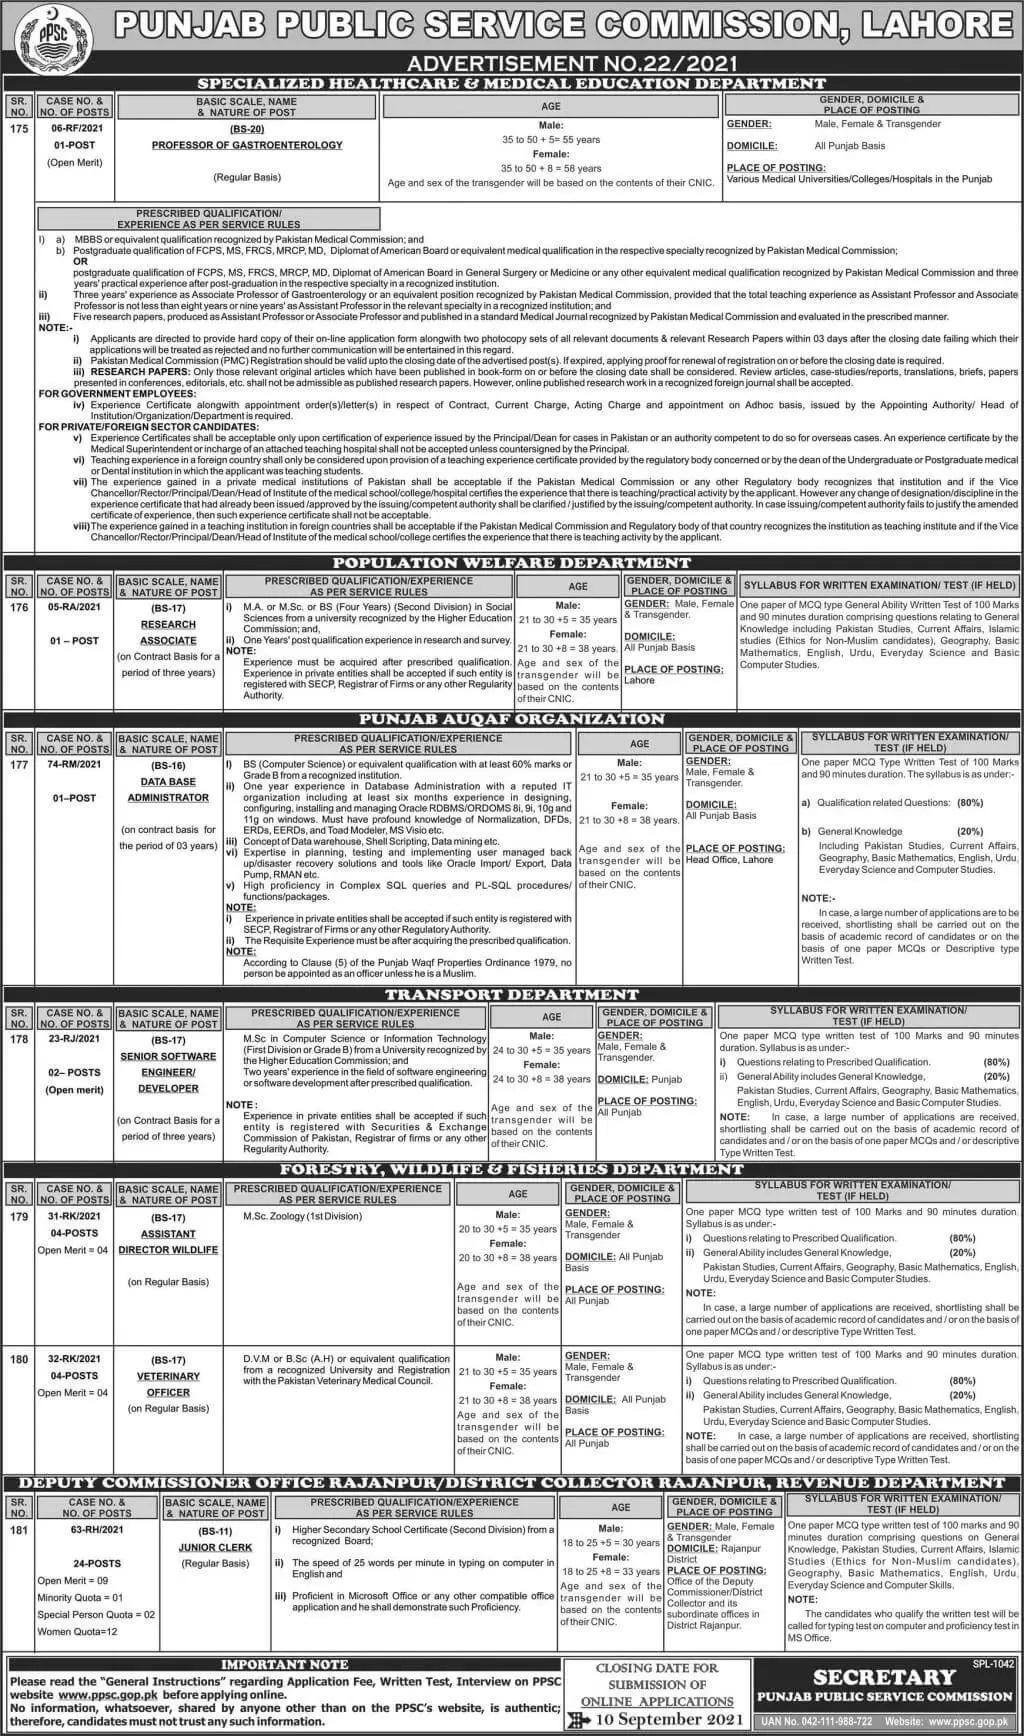 PPSC Jobs Today September 2021 Punjab Public Service Commission